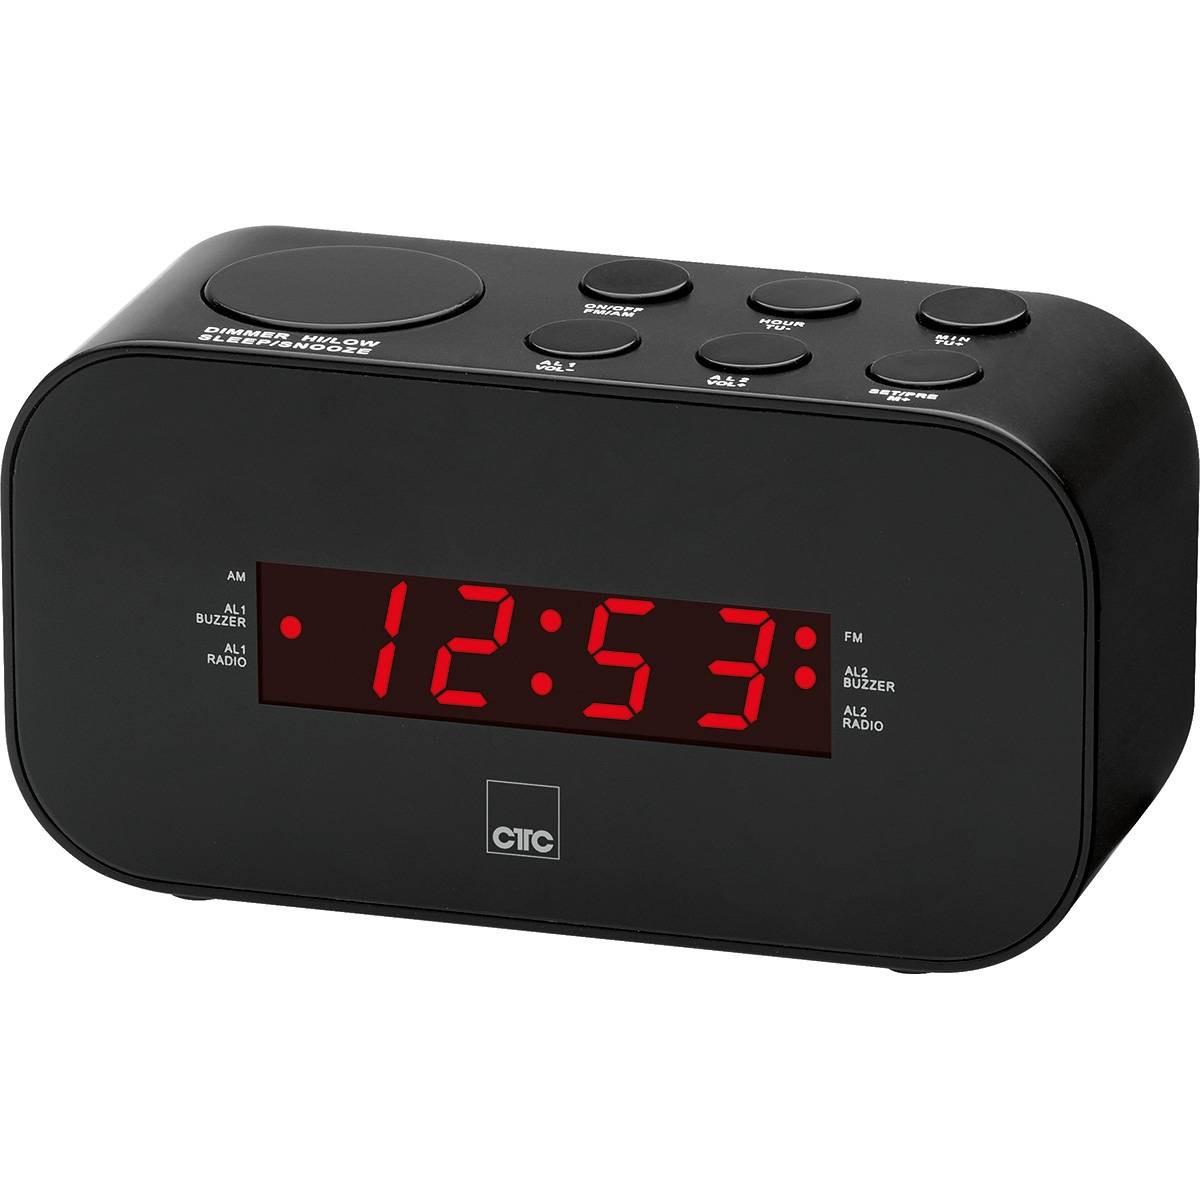 CTC Radio despertador MRC 7007 negro